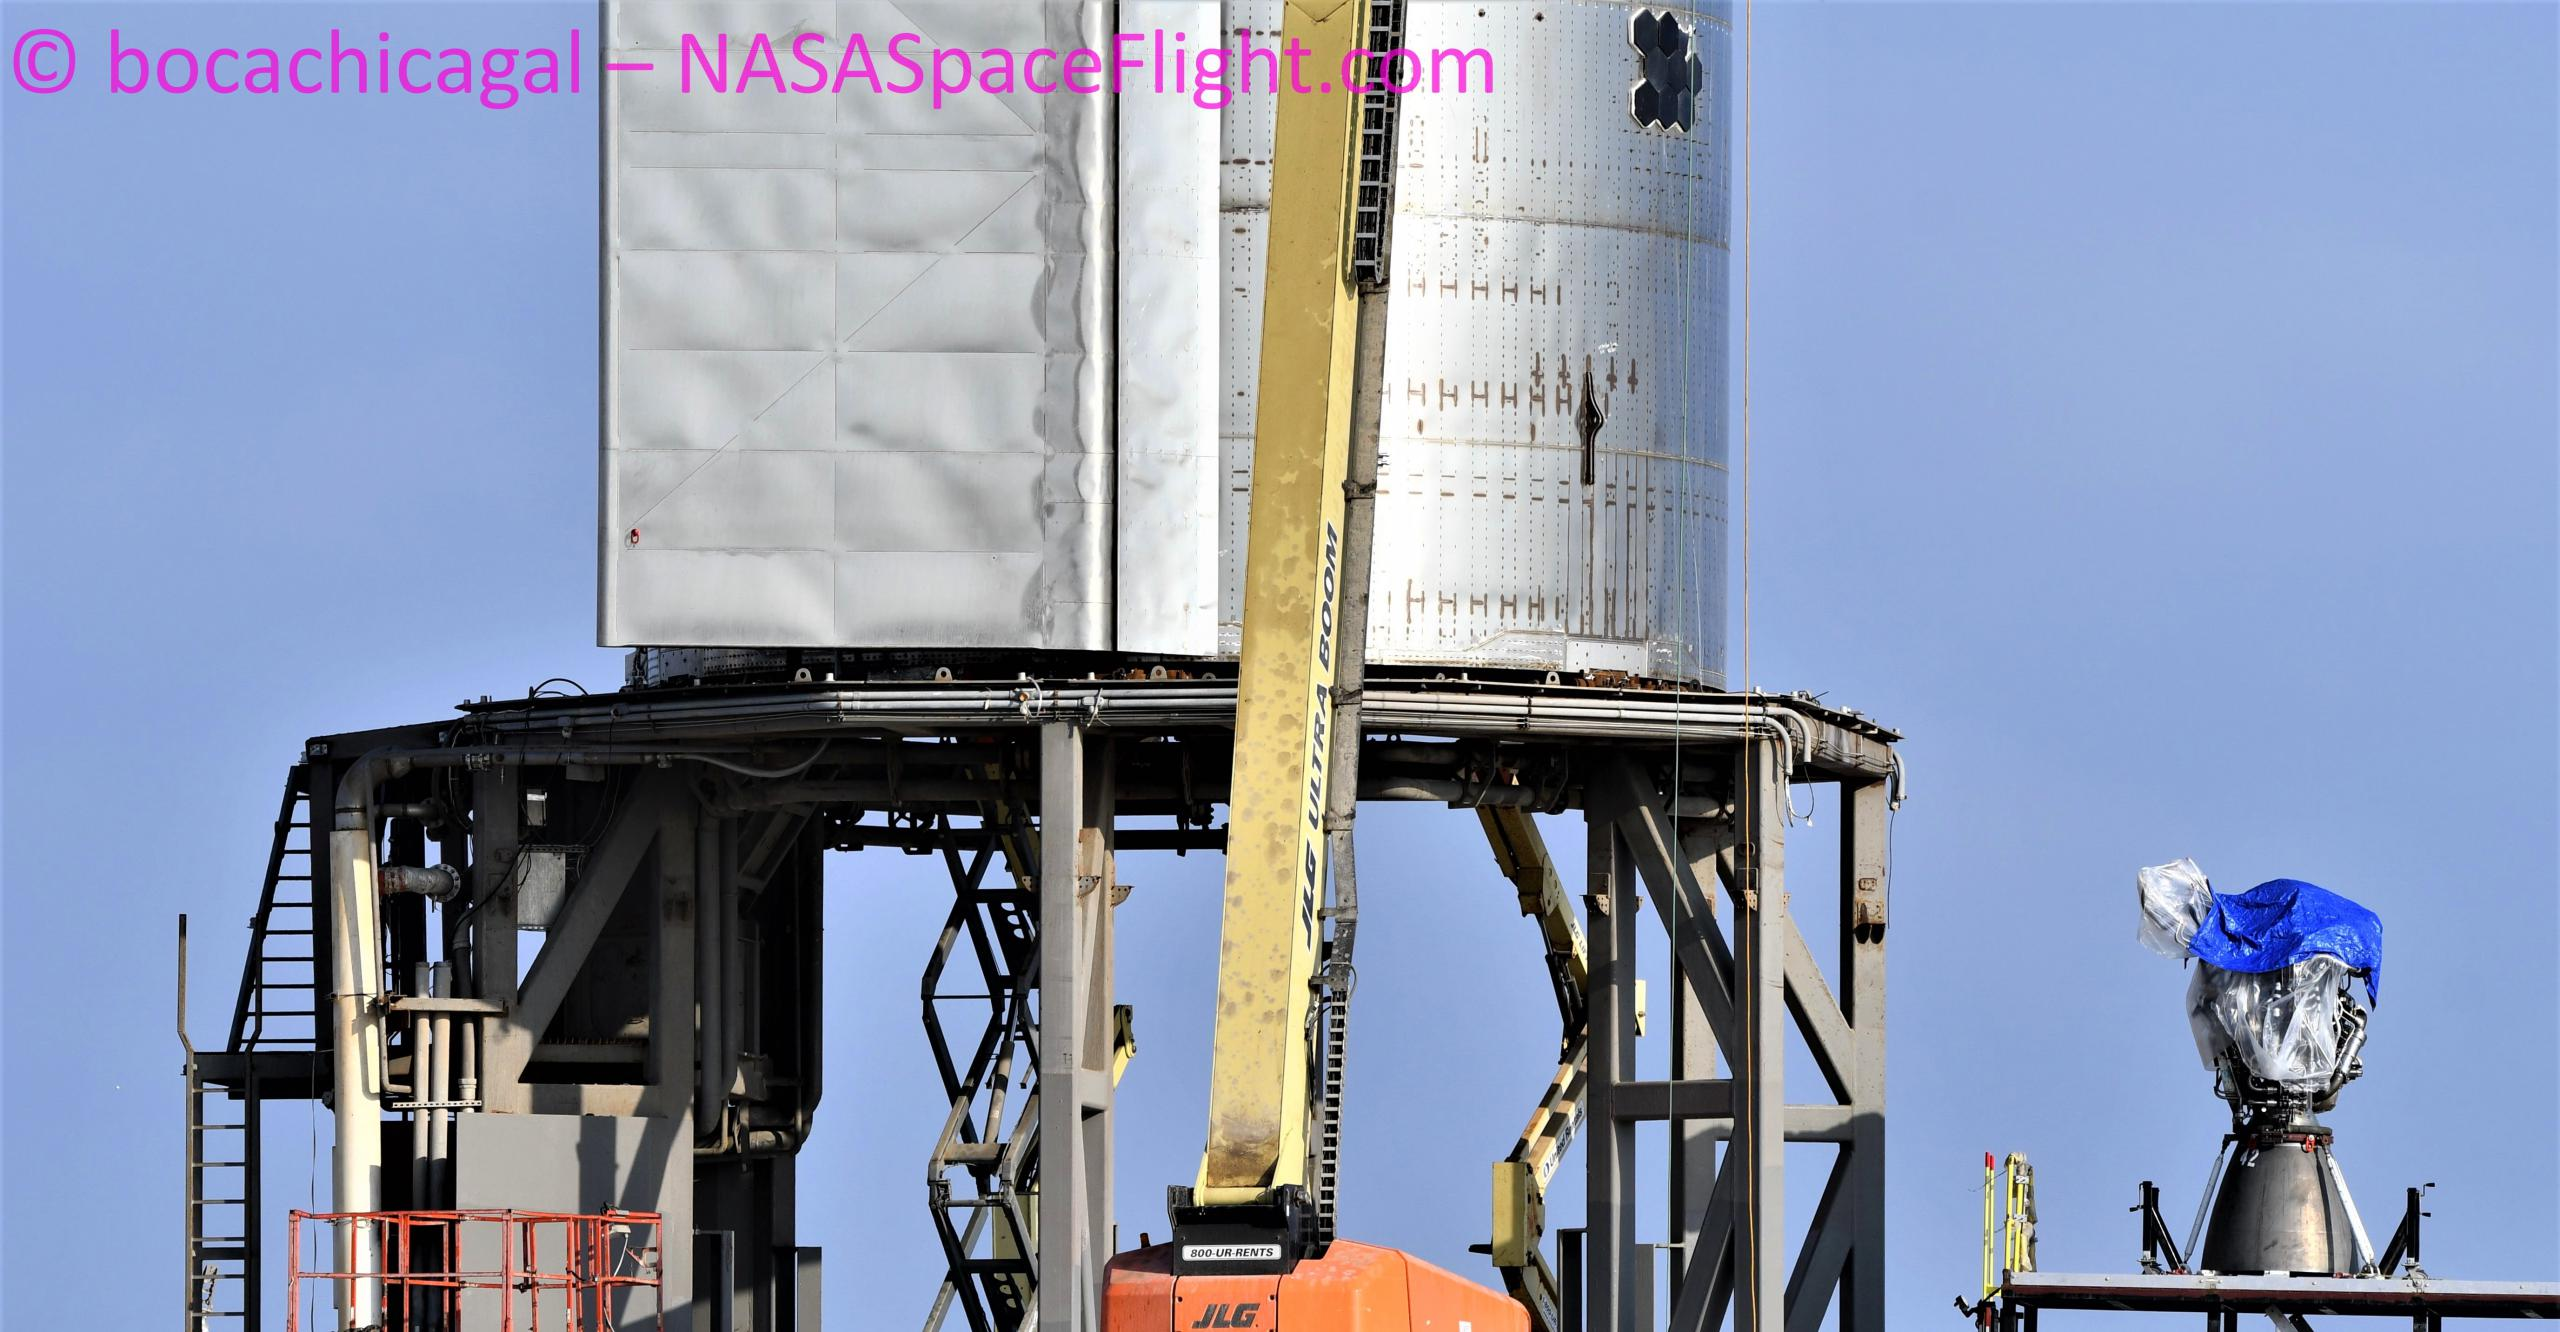 Starship Boca Chica 111520 (NASASpaceflight – bocachicagal) SN8 Raptor SN42 install abort 1 crop (c)